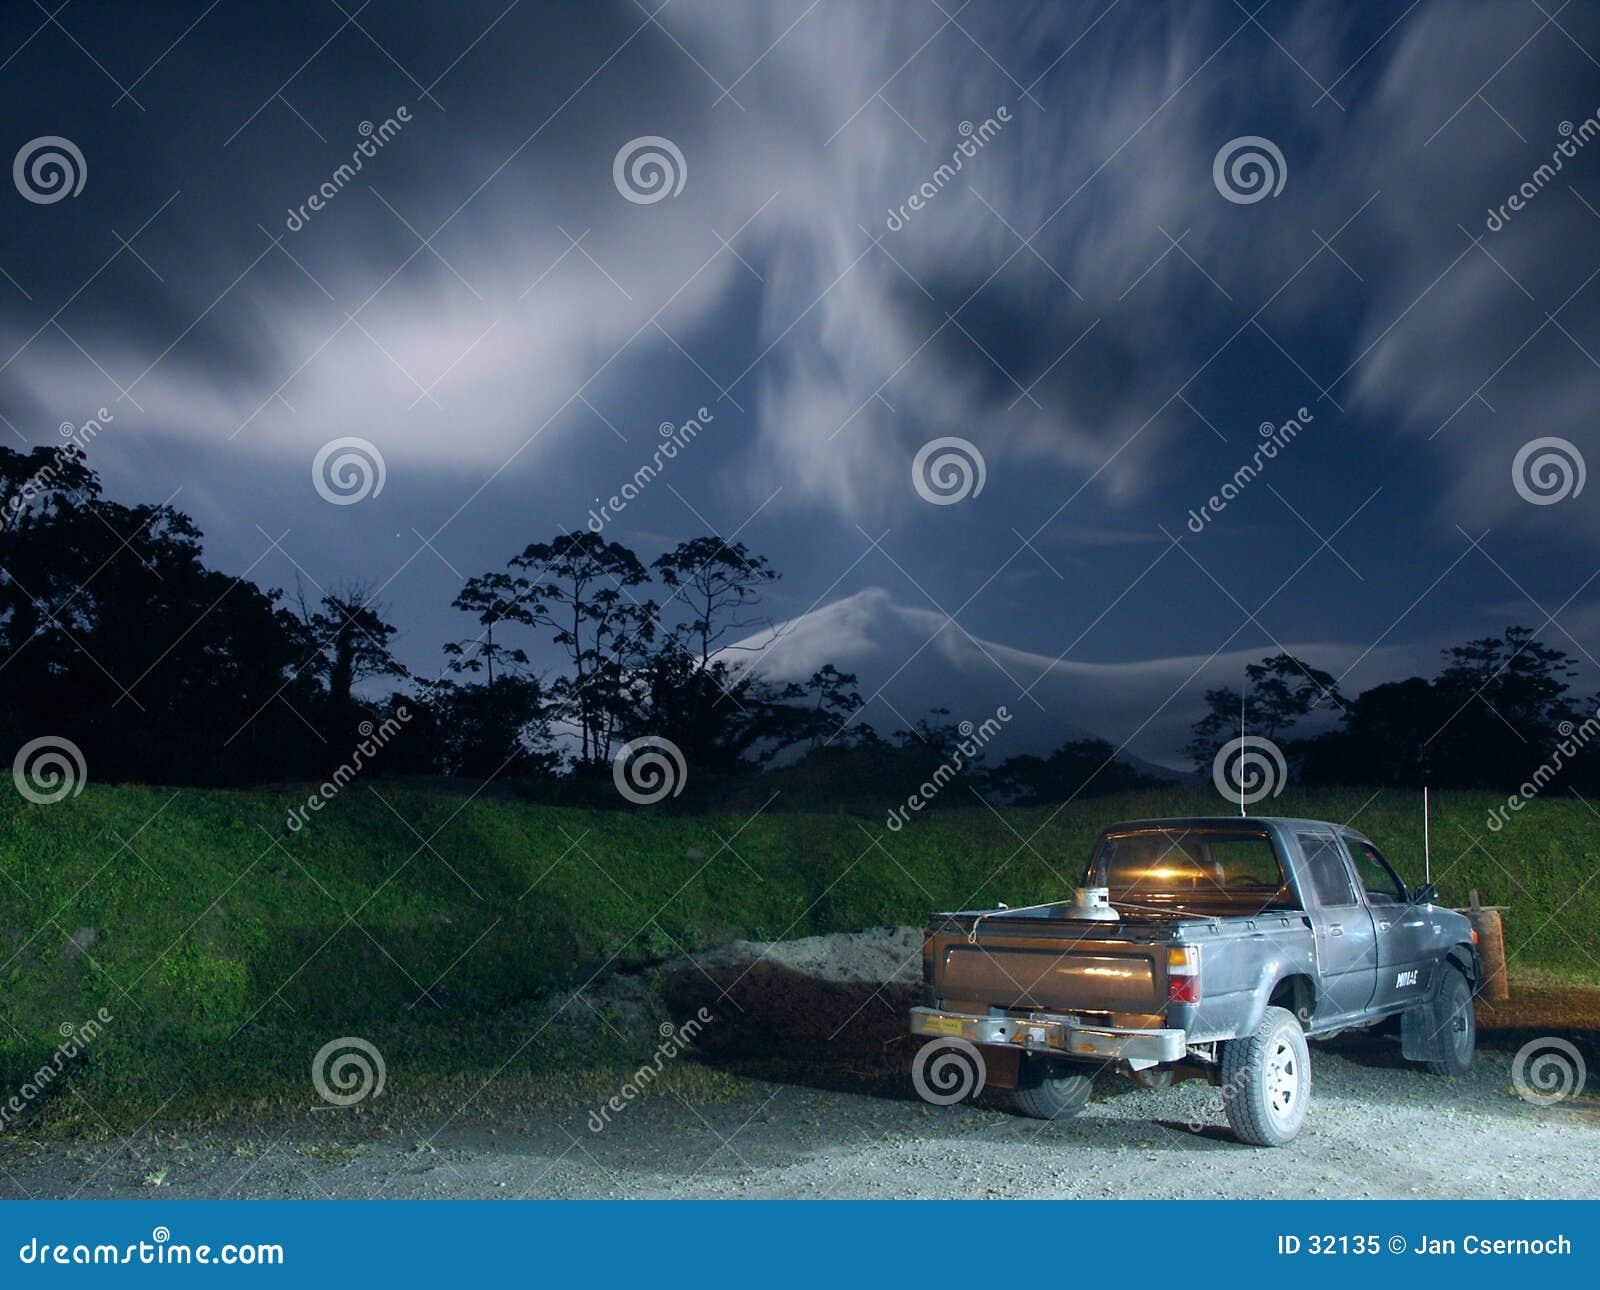 Pickup truck in moonlight near Arenal Volcano